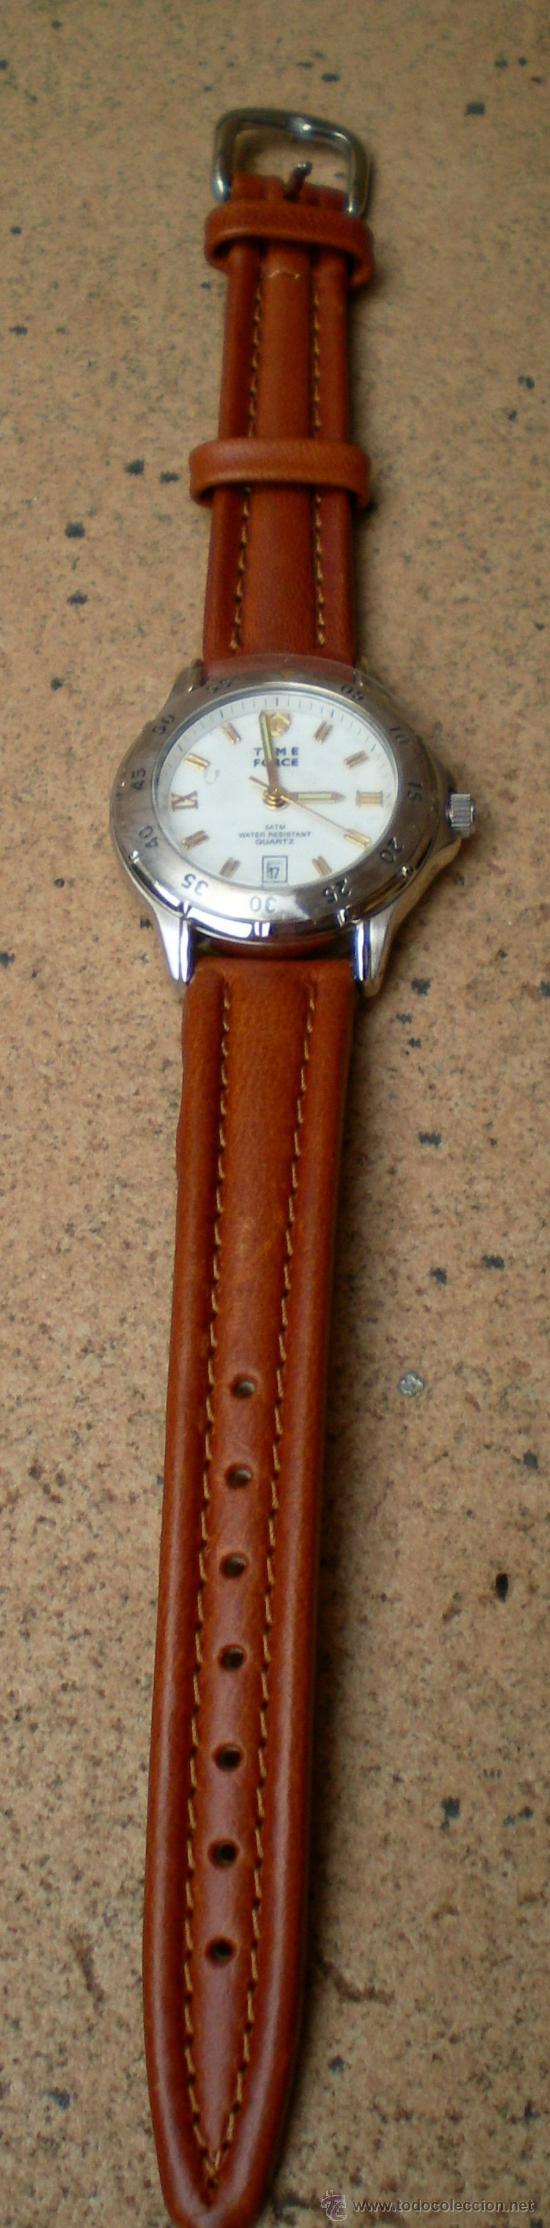 Relojes: Reloj de pulsera de mujer Time Force - Foto 7 - 38329872